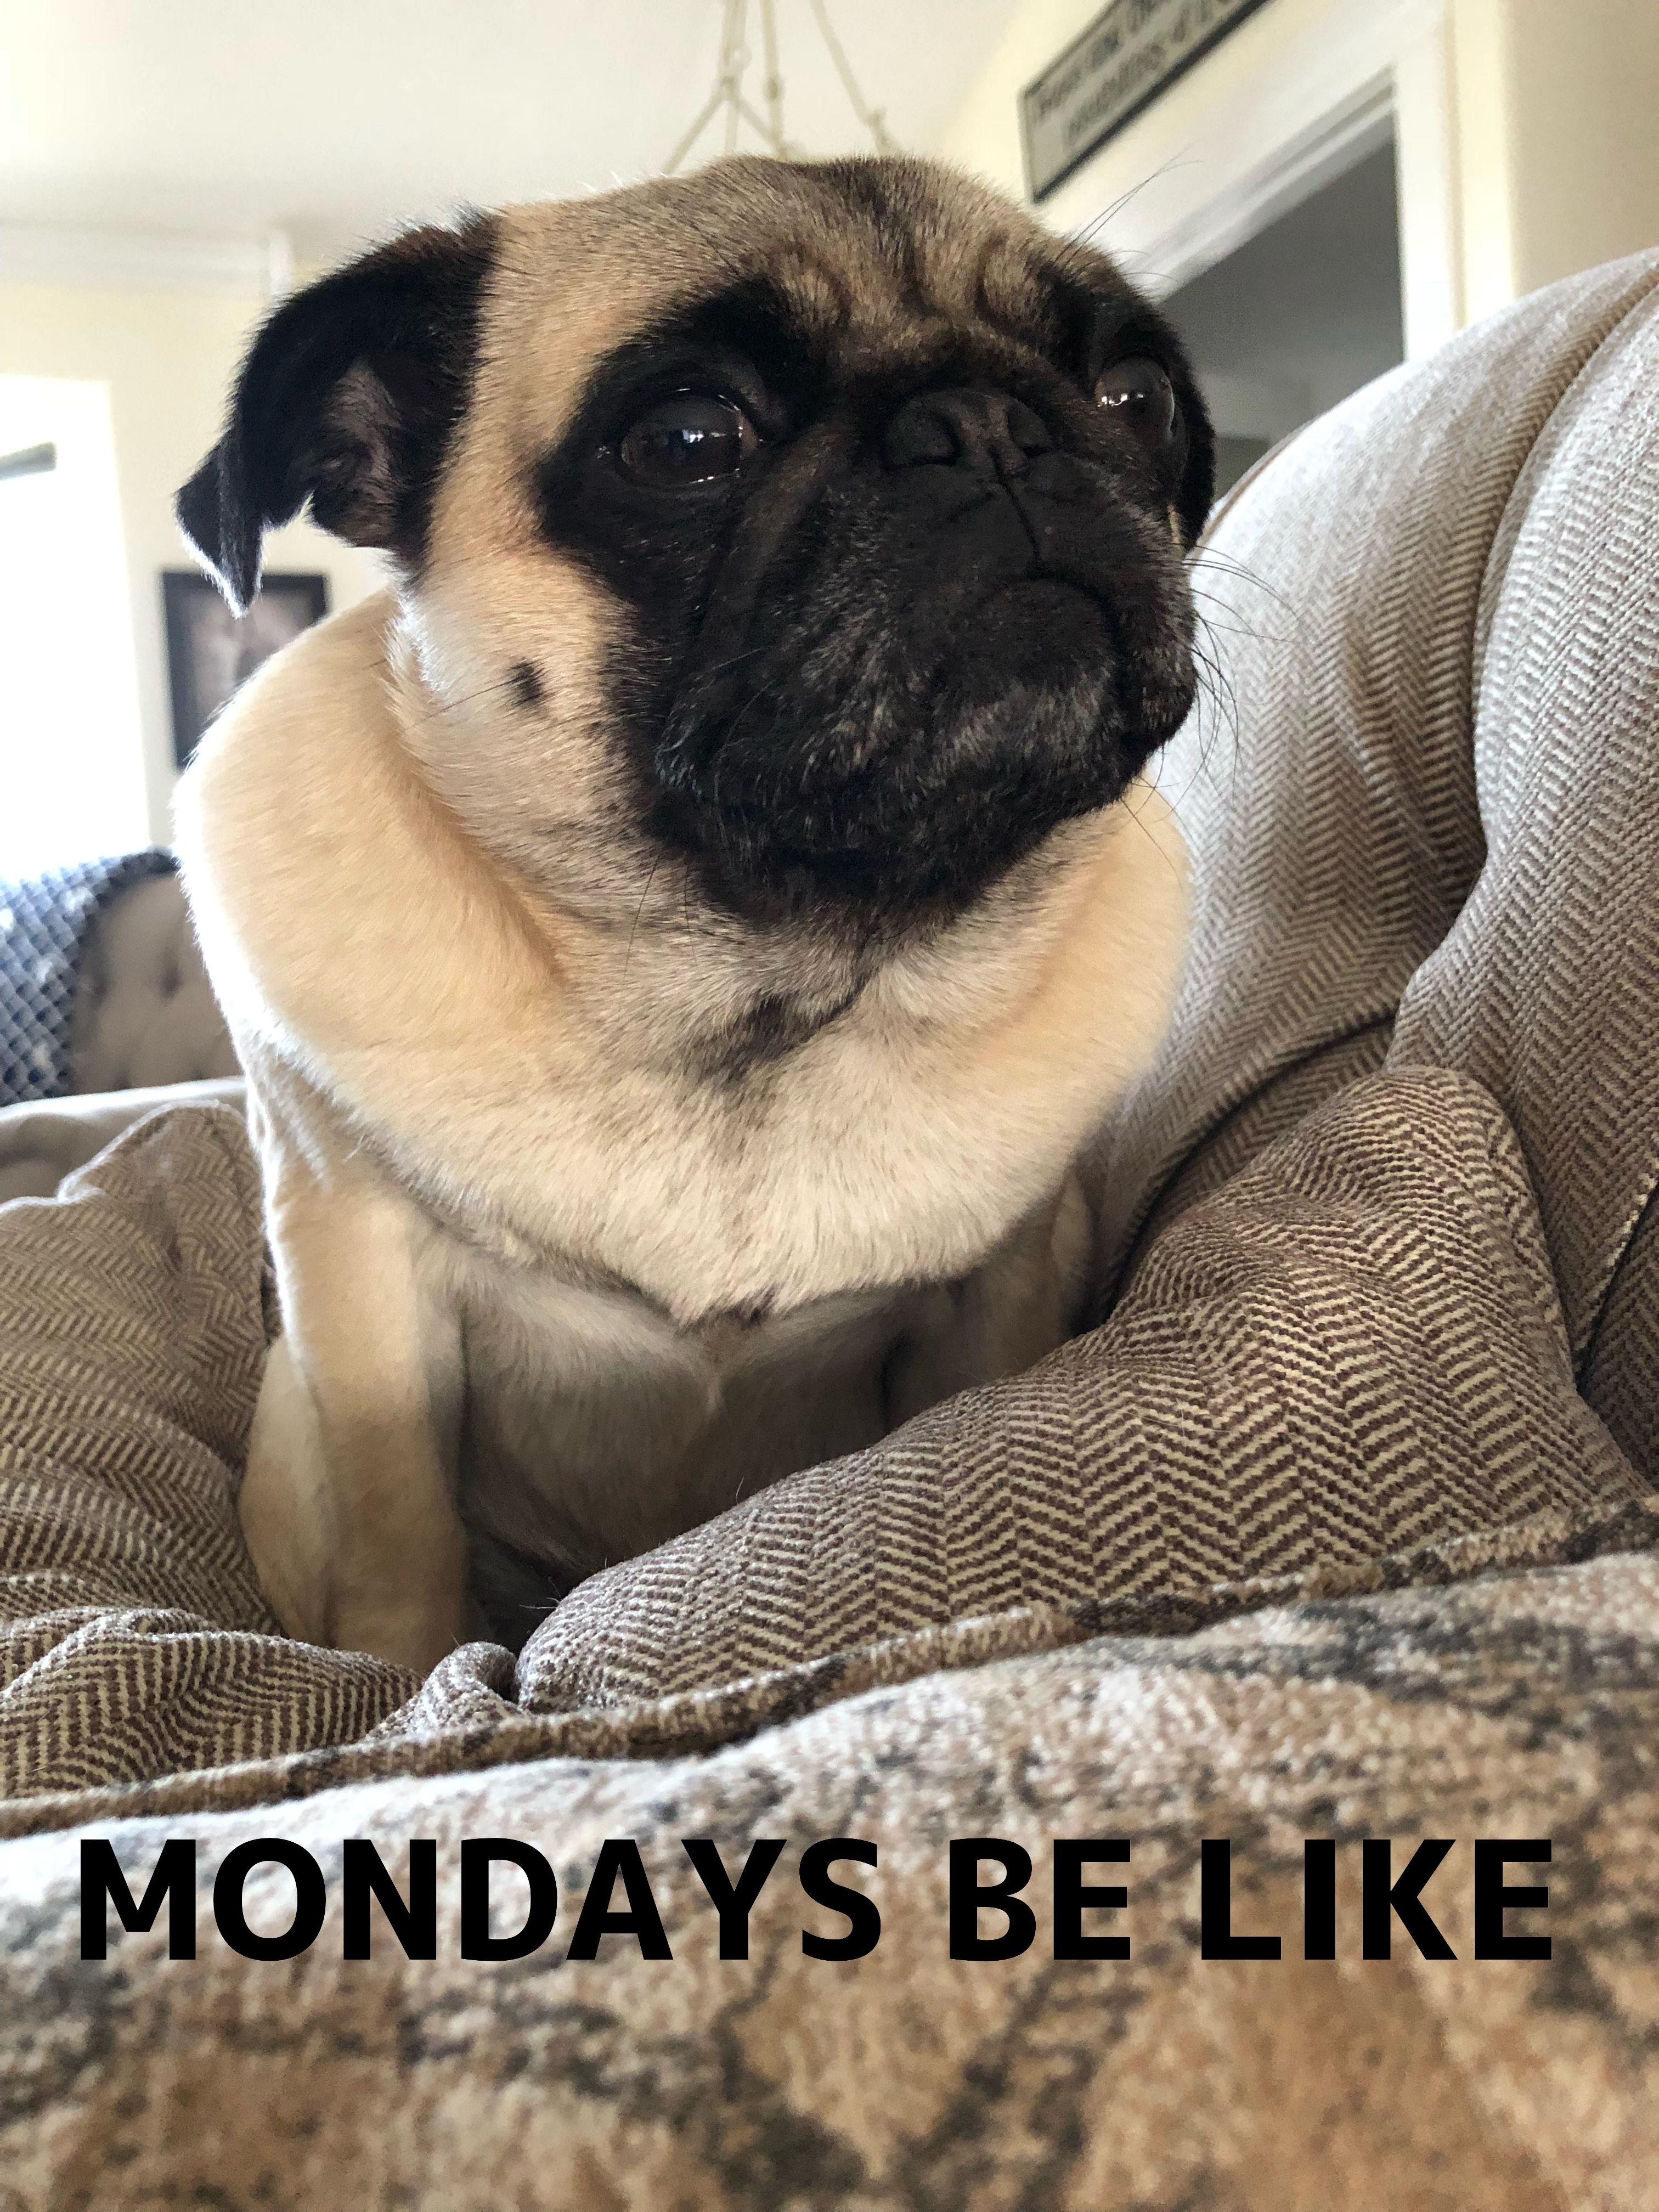 Pug Meme Monday Pugs Dogs Puppies